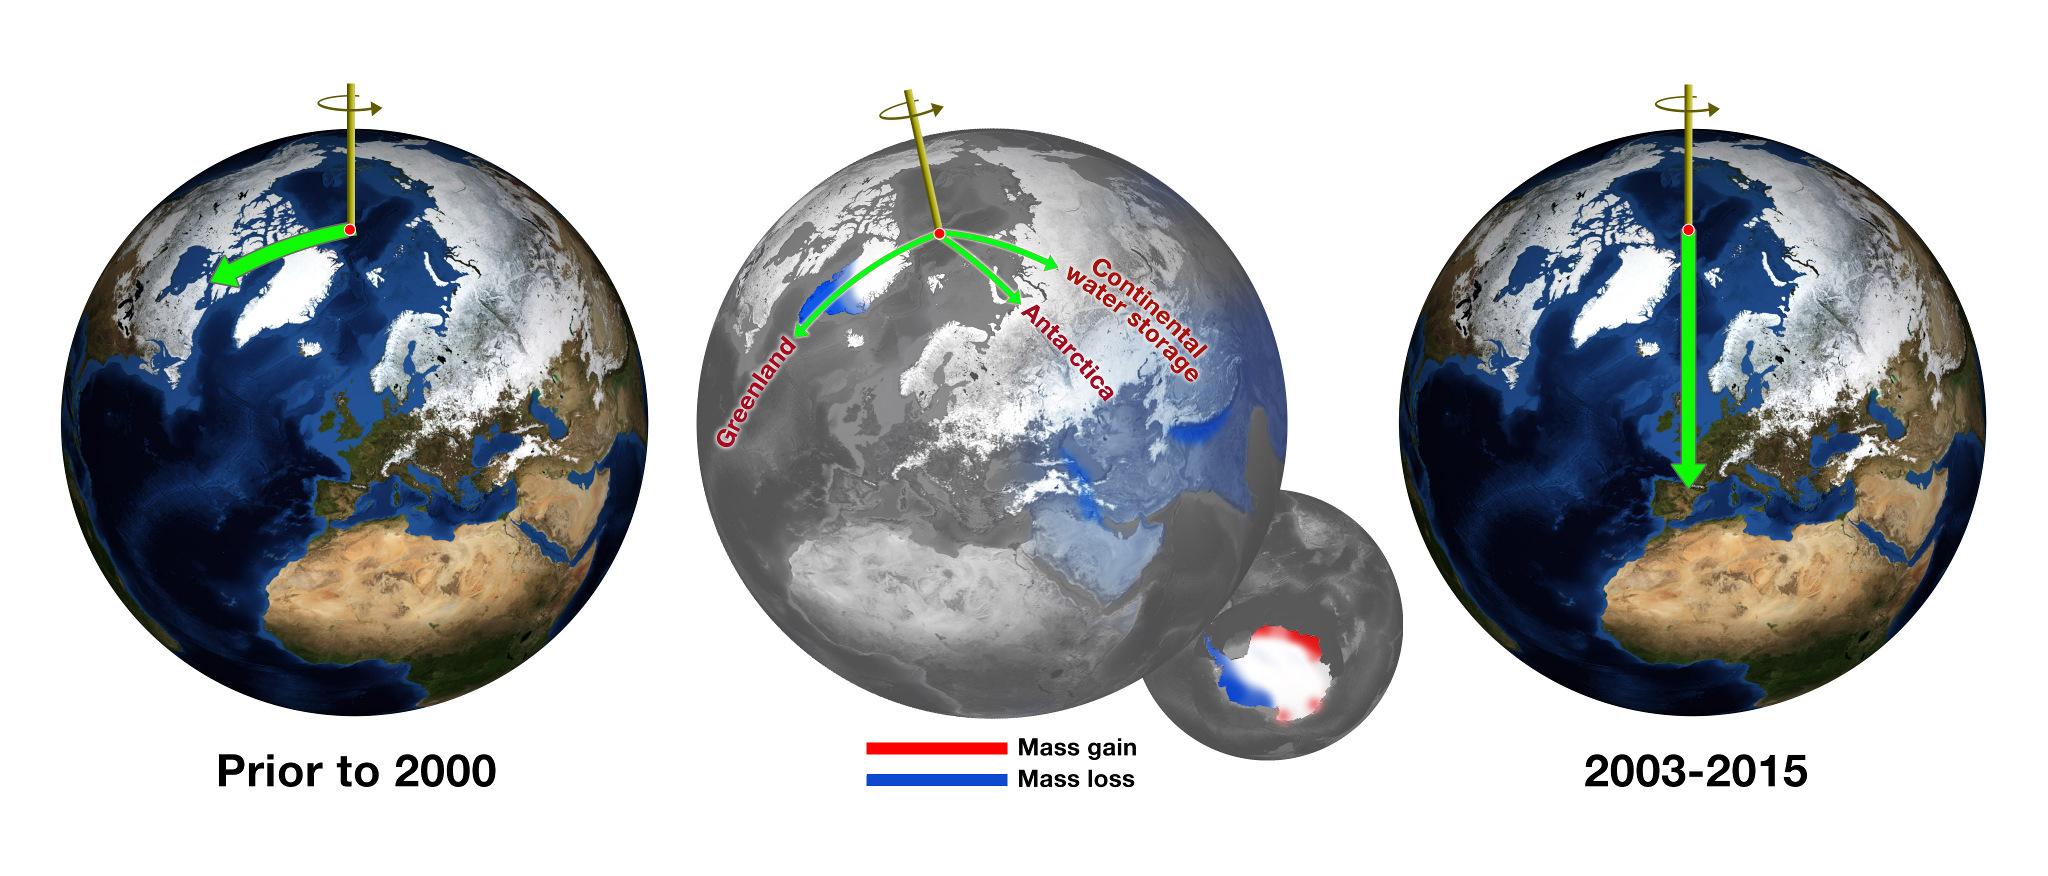 Illustration credits: NASA/JPL-Caltech.